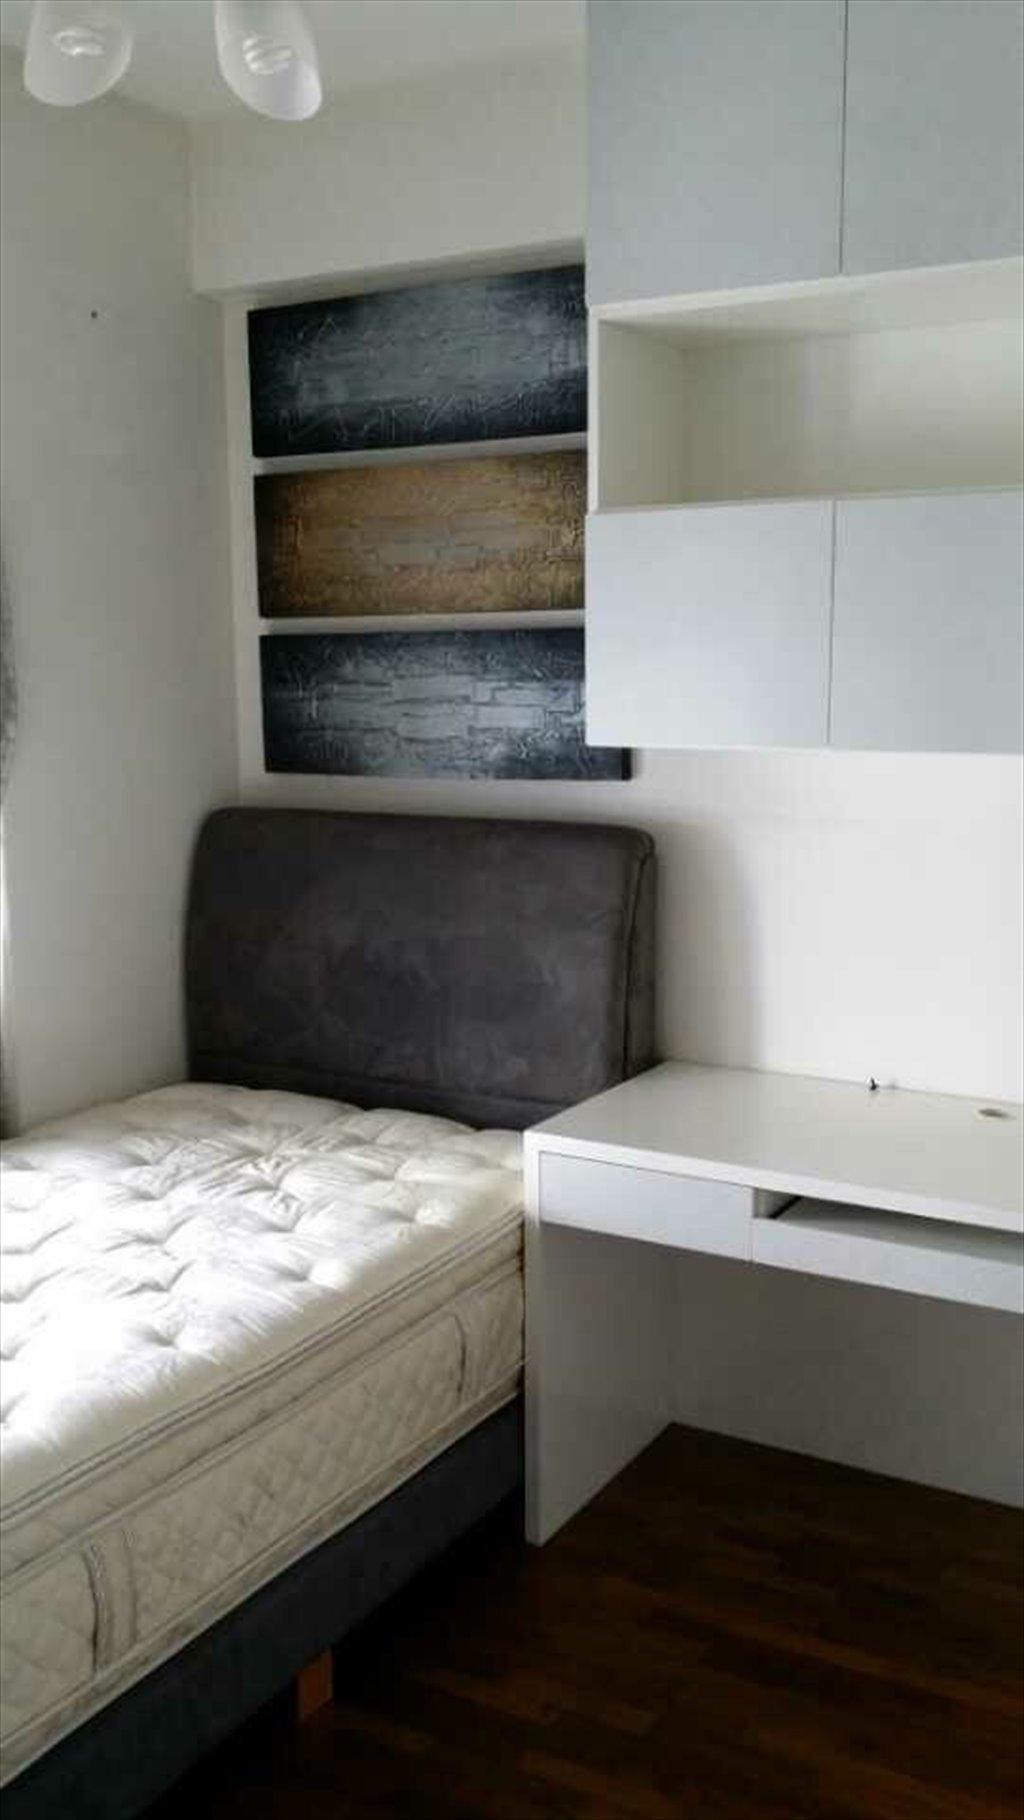 Room For Rent In Woodlands Crescent Woodlands D25 28 North 20